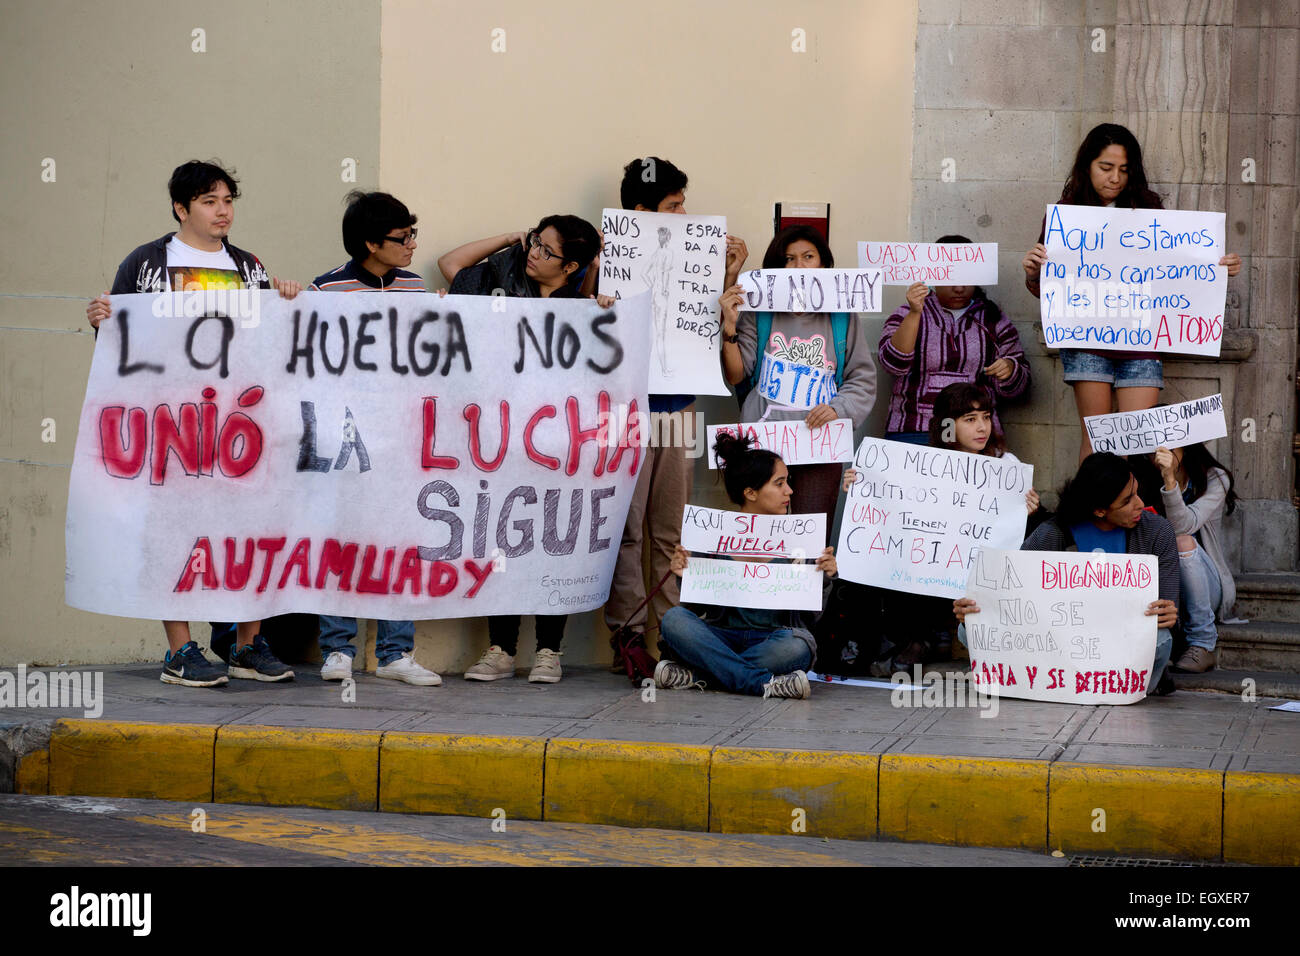 Universität Studentendemonstration, Merida, Yucatan, Mexiko Stockfoto